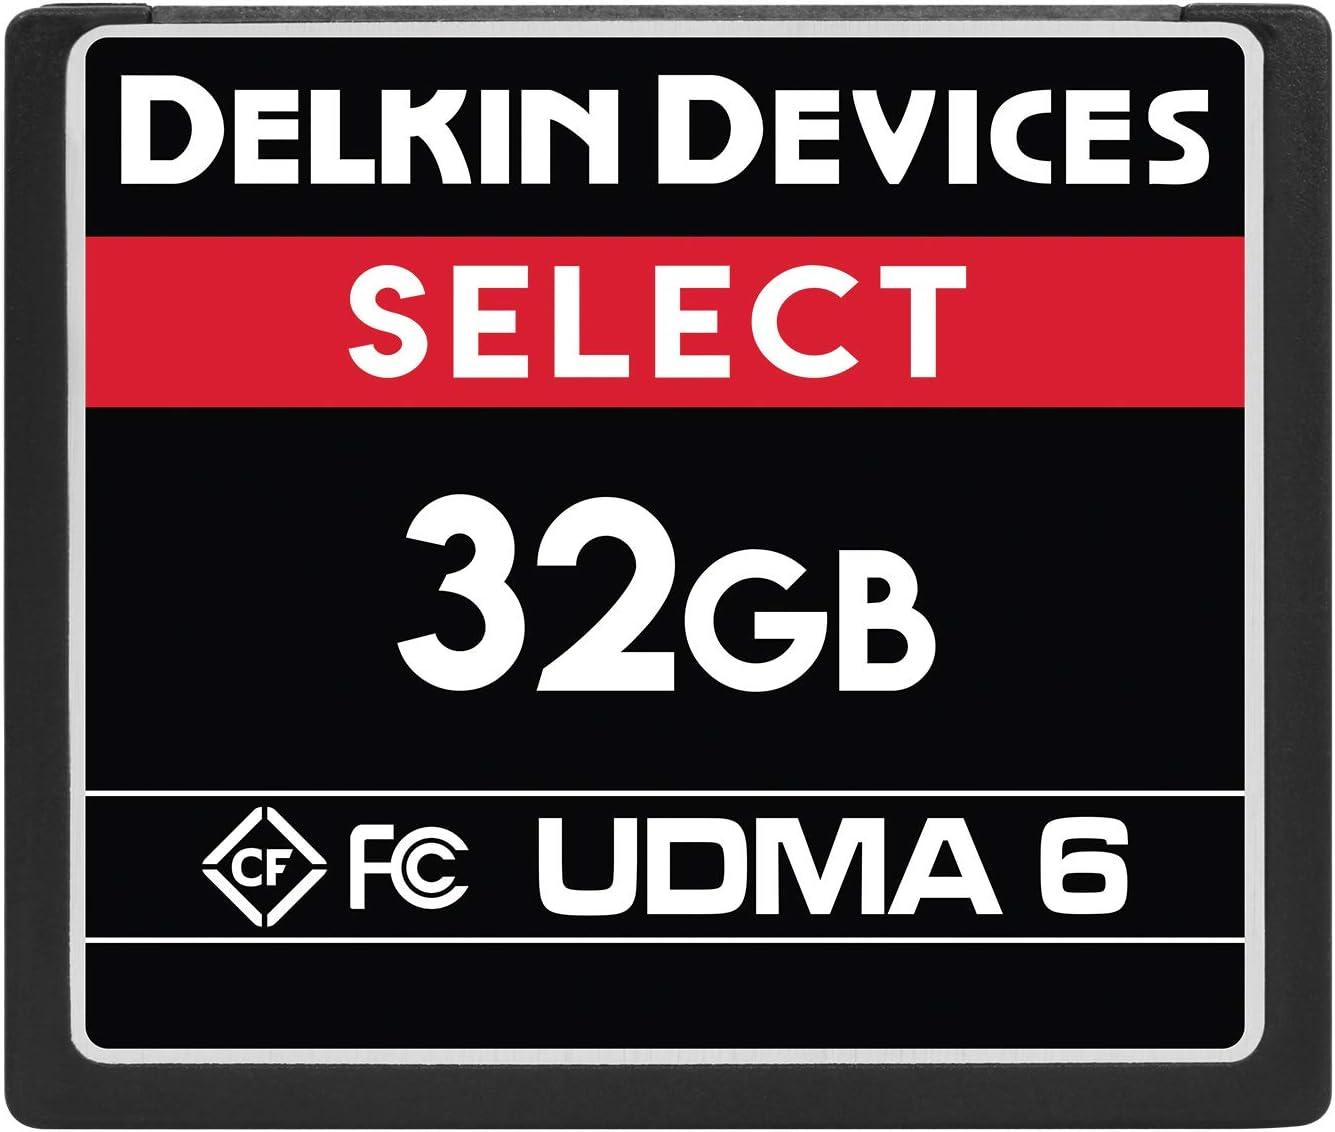 Delkin Devices 32GB Select CompactFlash UDMA 6 Memory Card (DDCFR50032GB)